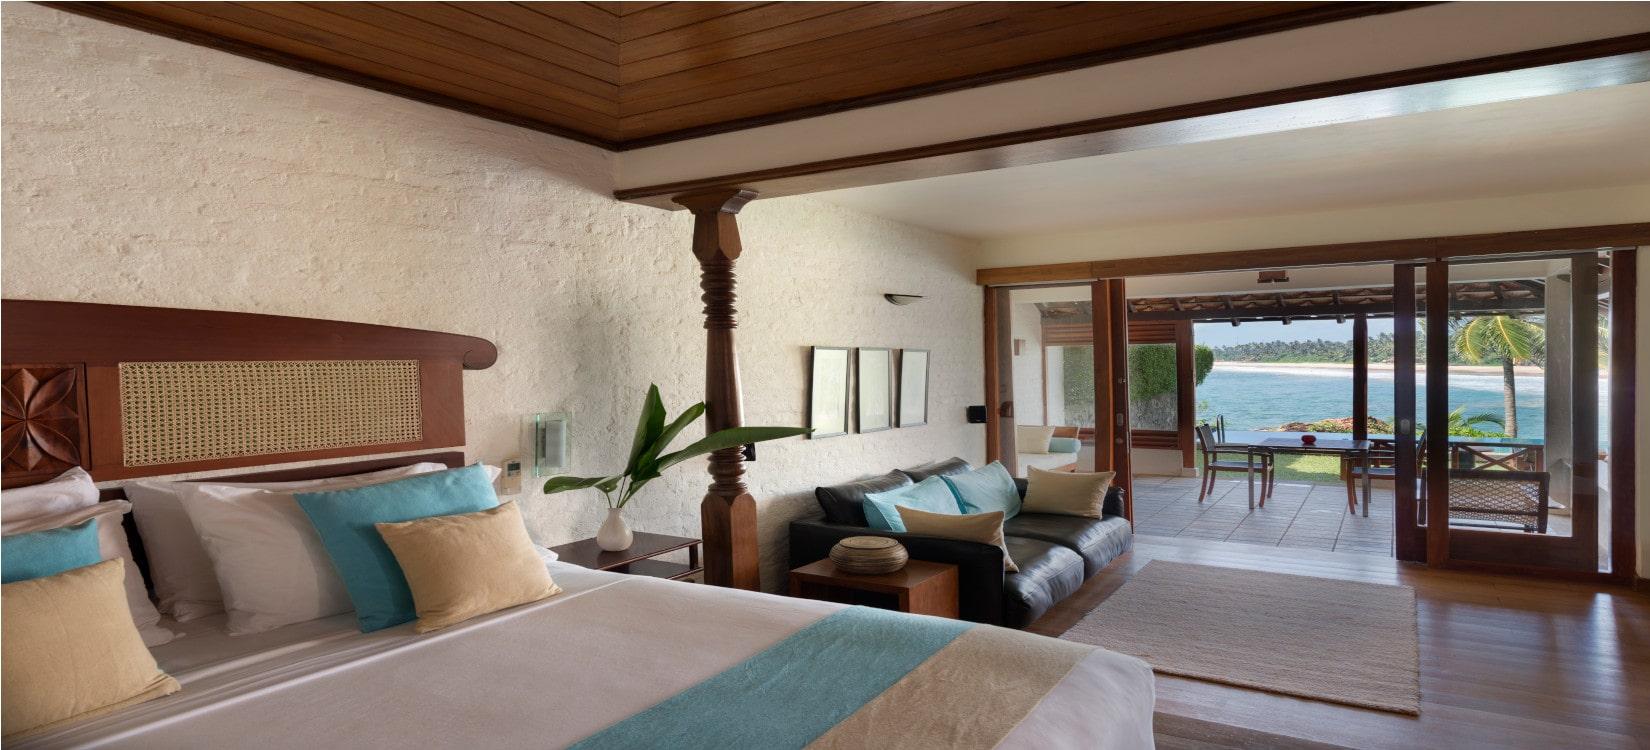 deluxe with pool saman villa-min